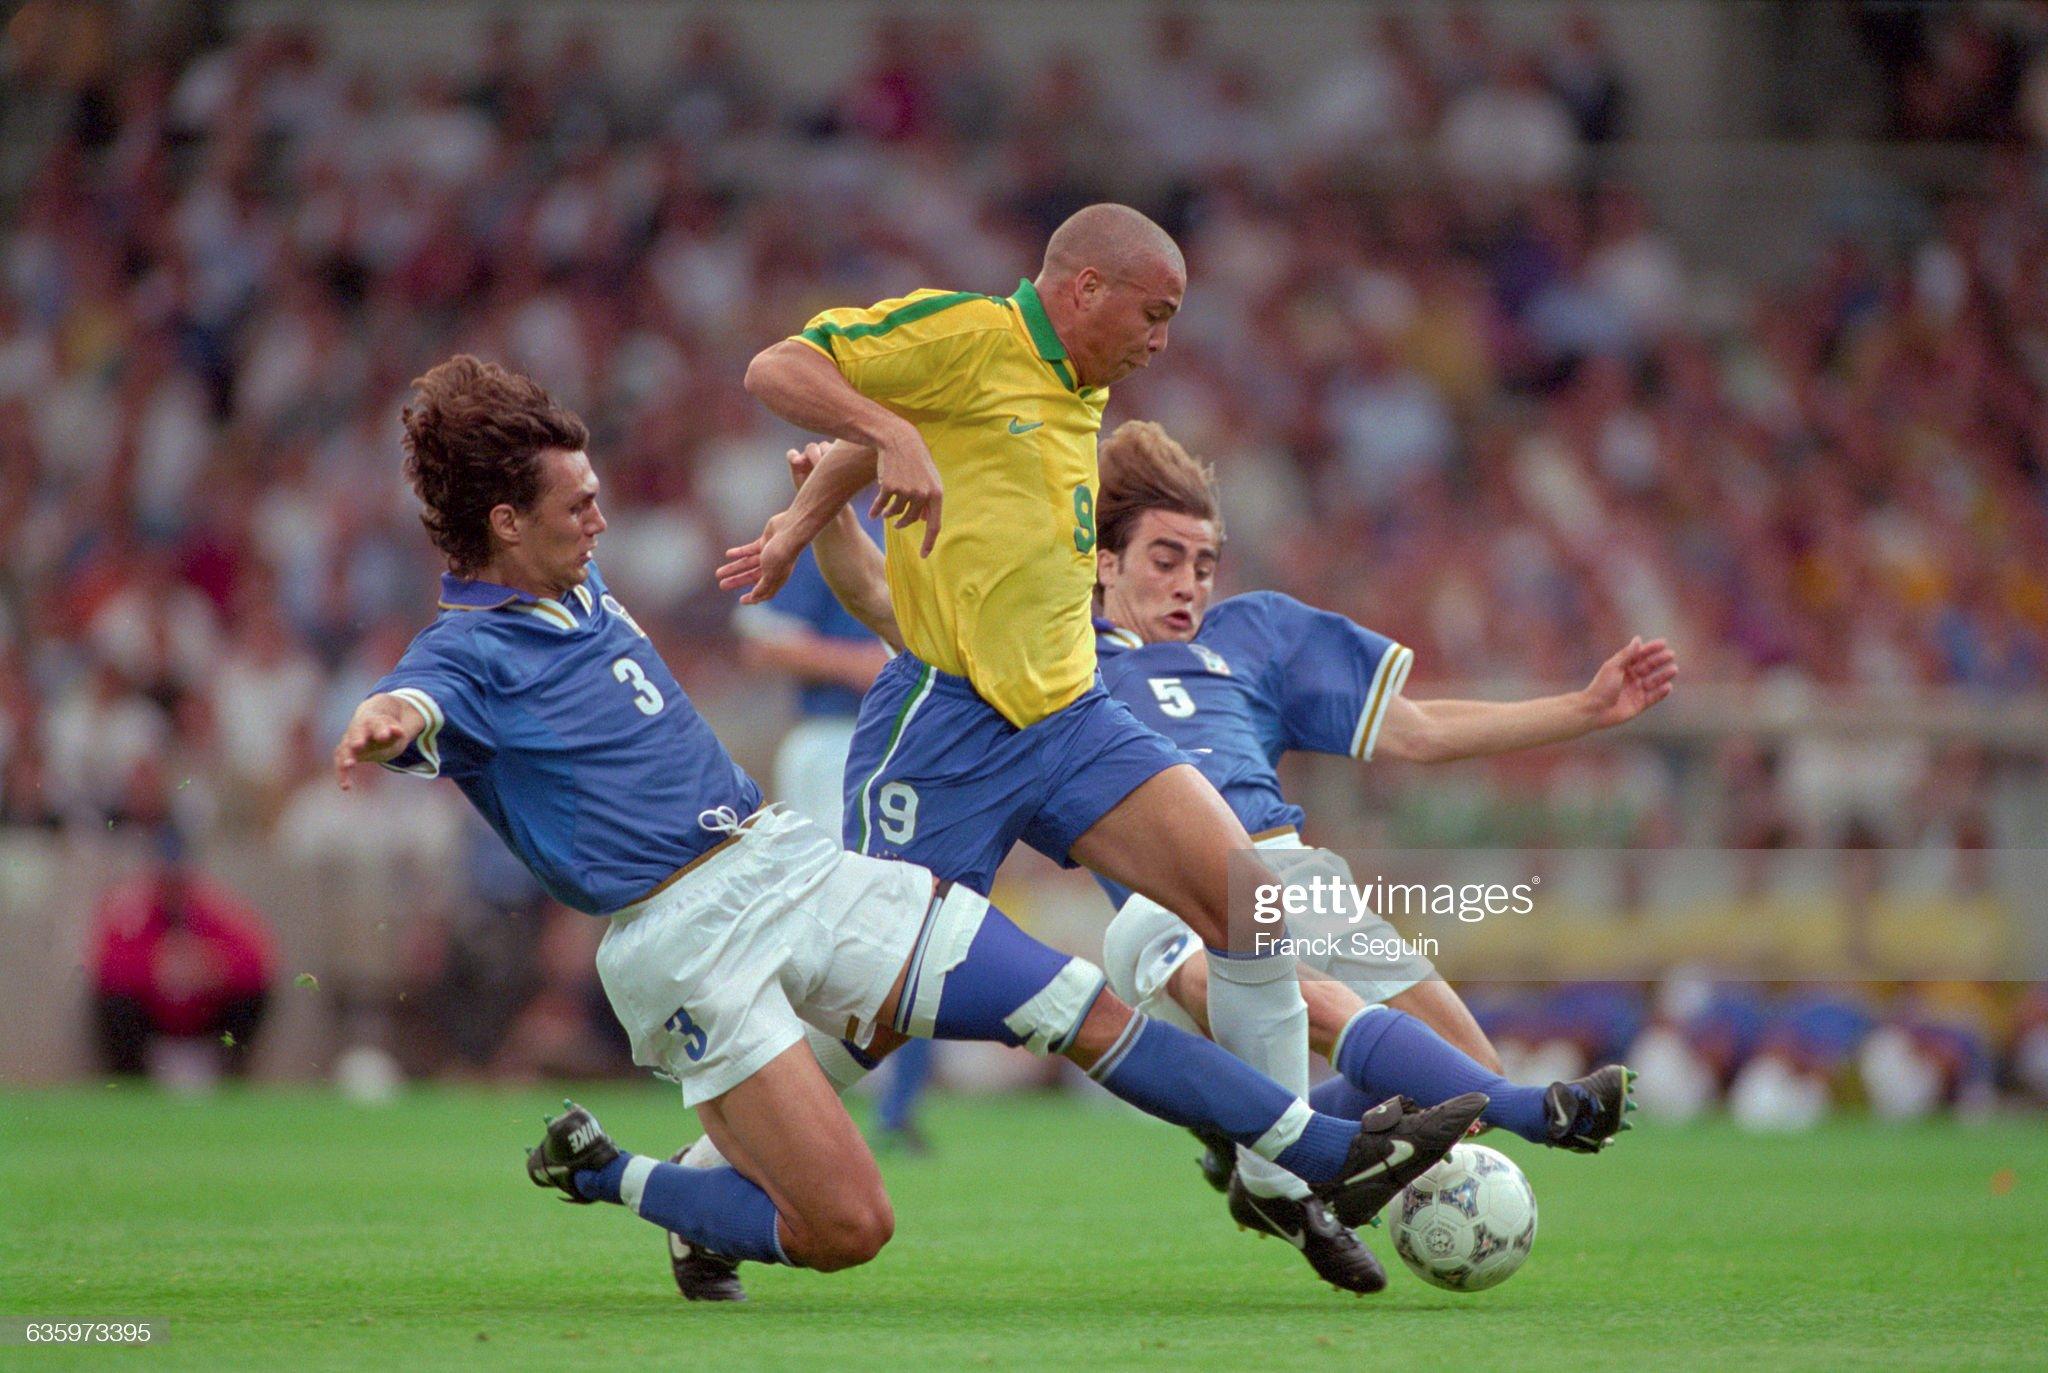 Footballer Ronaldo in Action Against Italy : News Photo